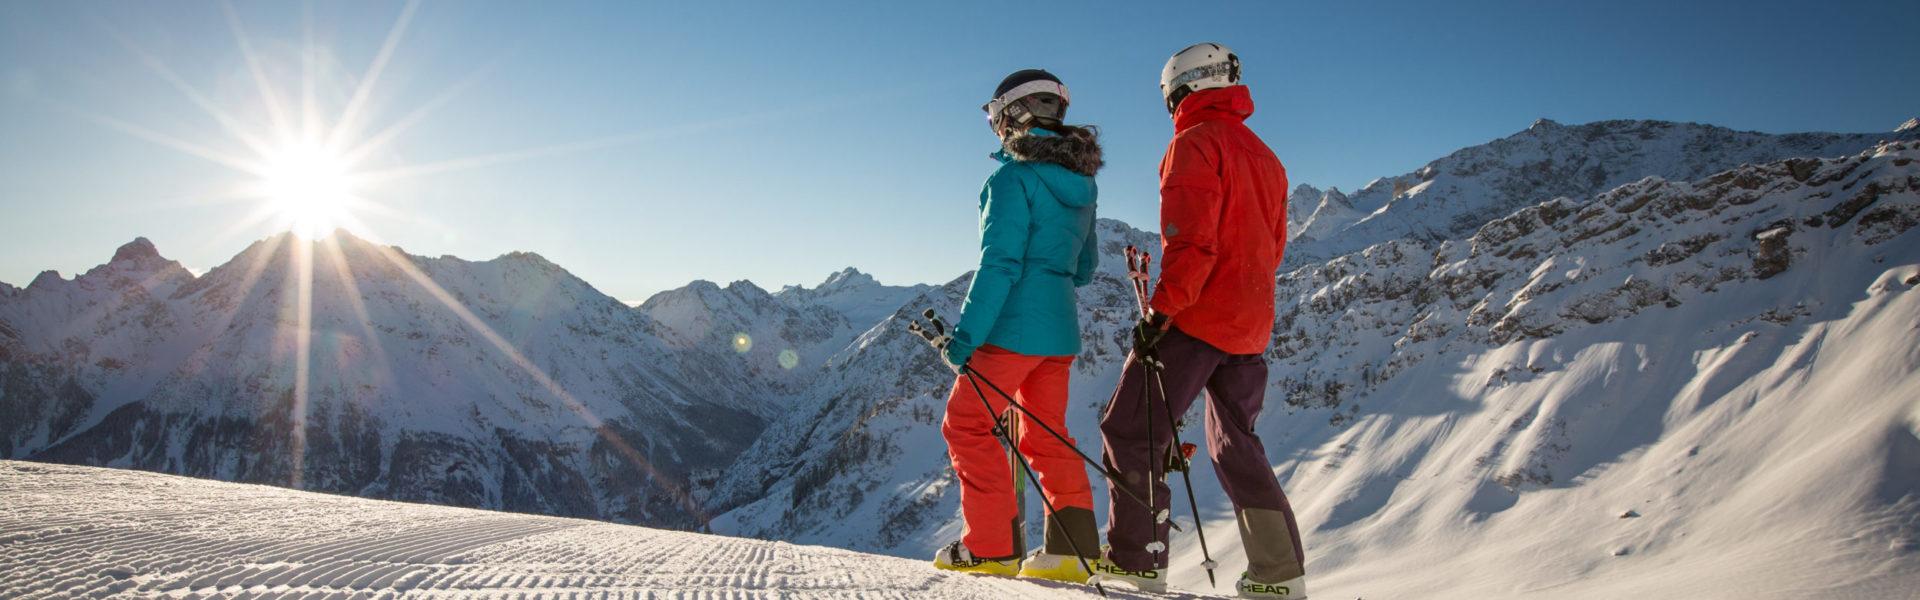 Skifahren im Brandnertal, Sonnenski Vorarlberg ©Michael Marte / Bergbahnen Brandnertal